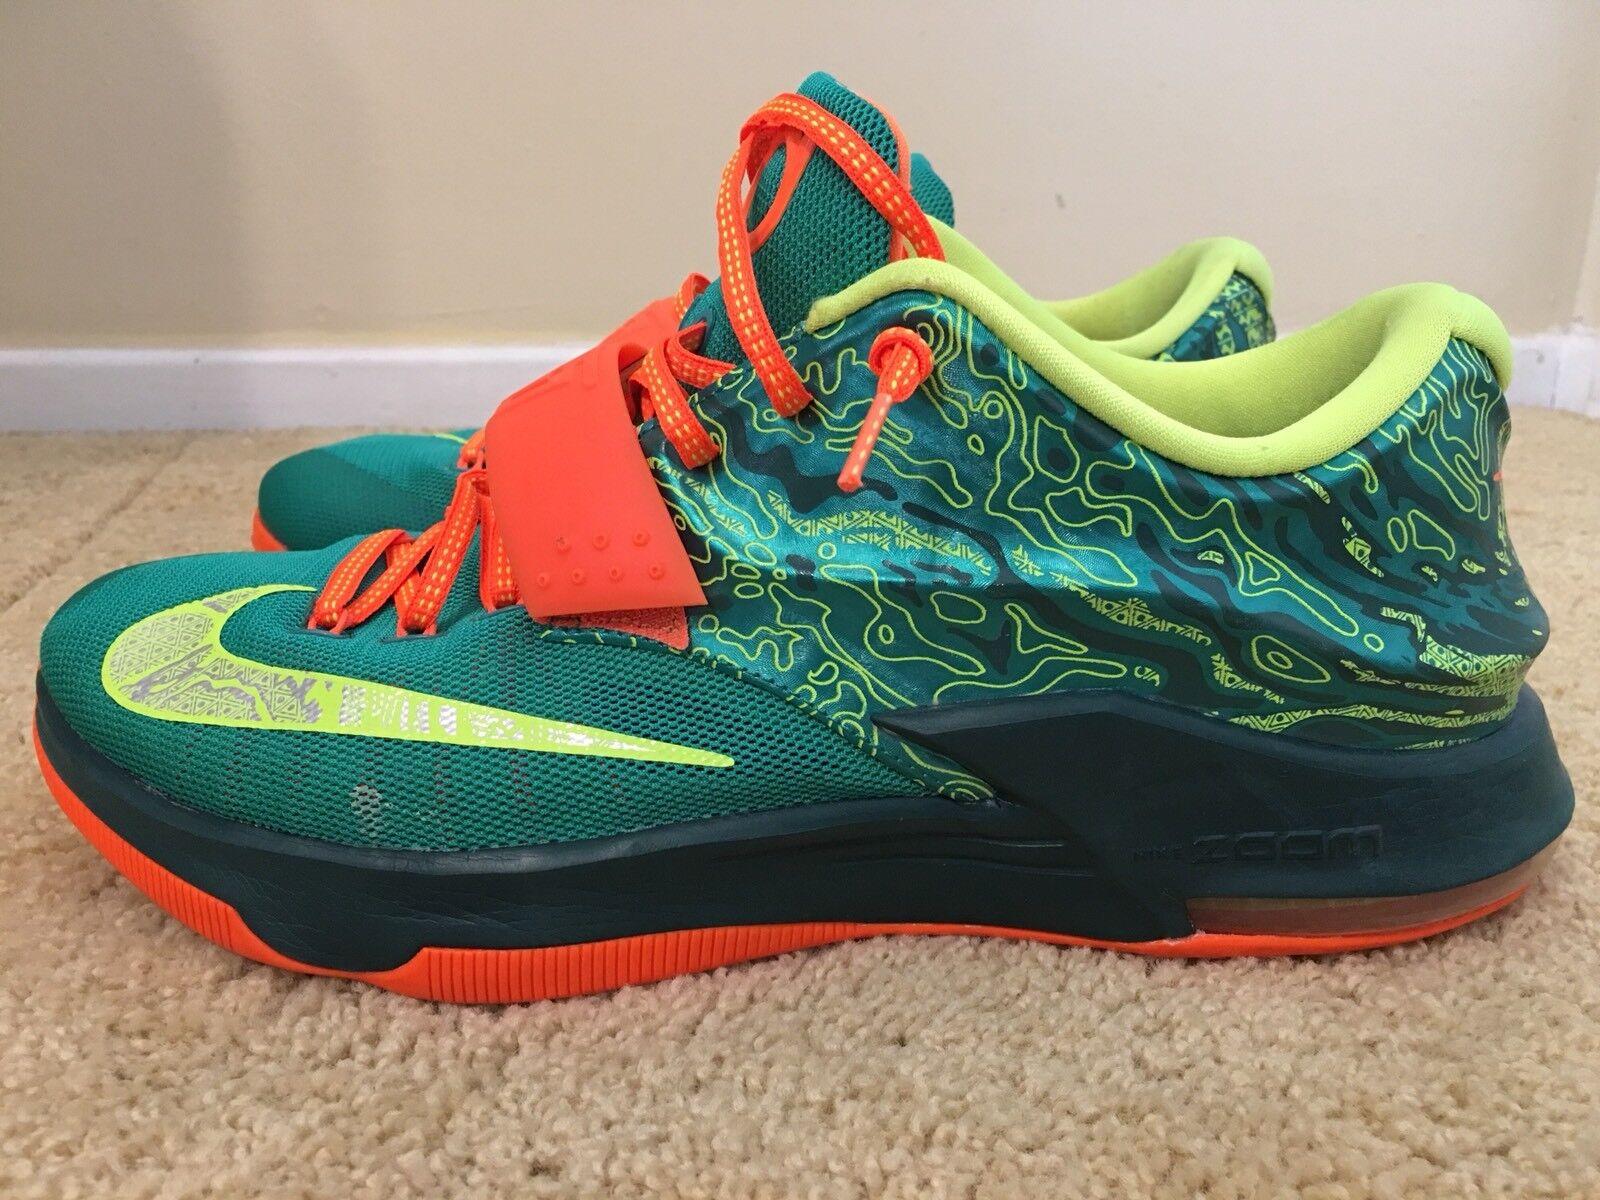 Nike KD VII meteorólogo, Verde baloncesto, Esmeralda 653996-303, Para Hombre Zapatillas de baloncesto, Verde tamaño 13 64b64e